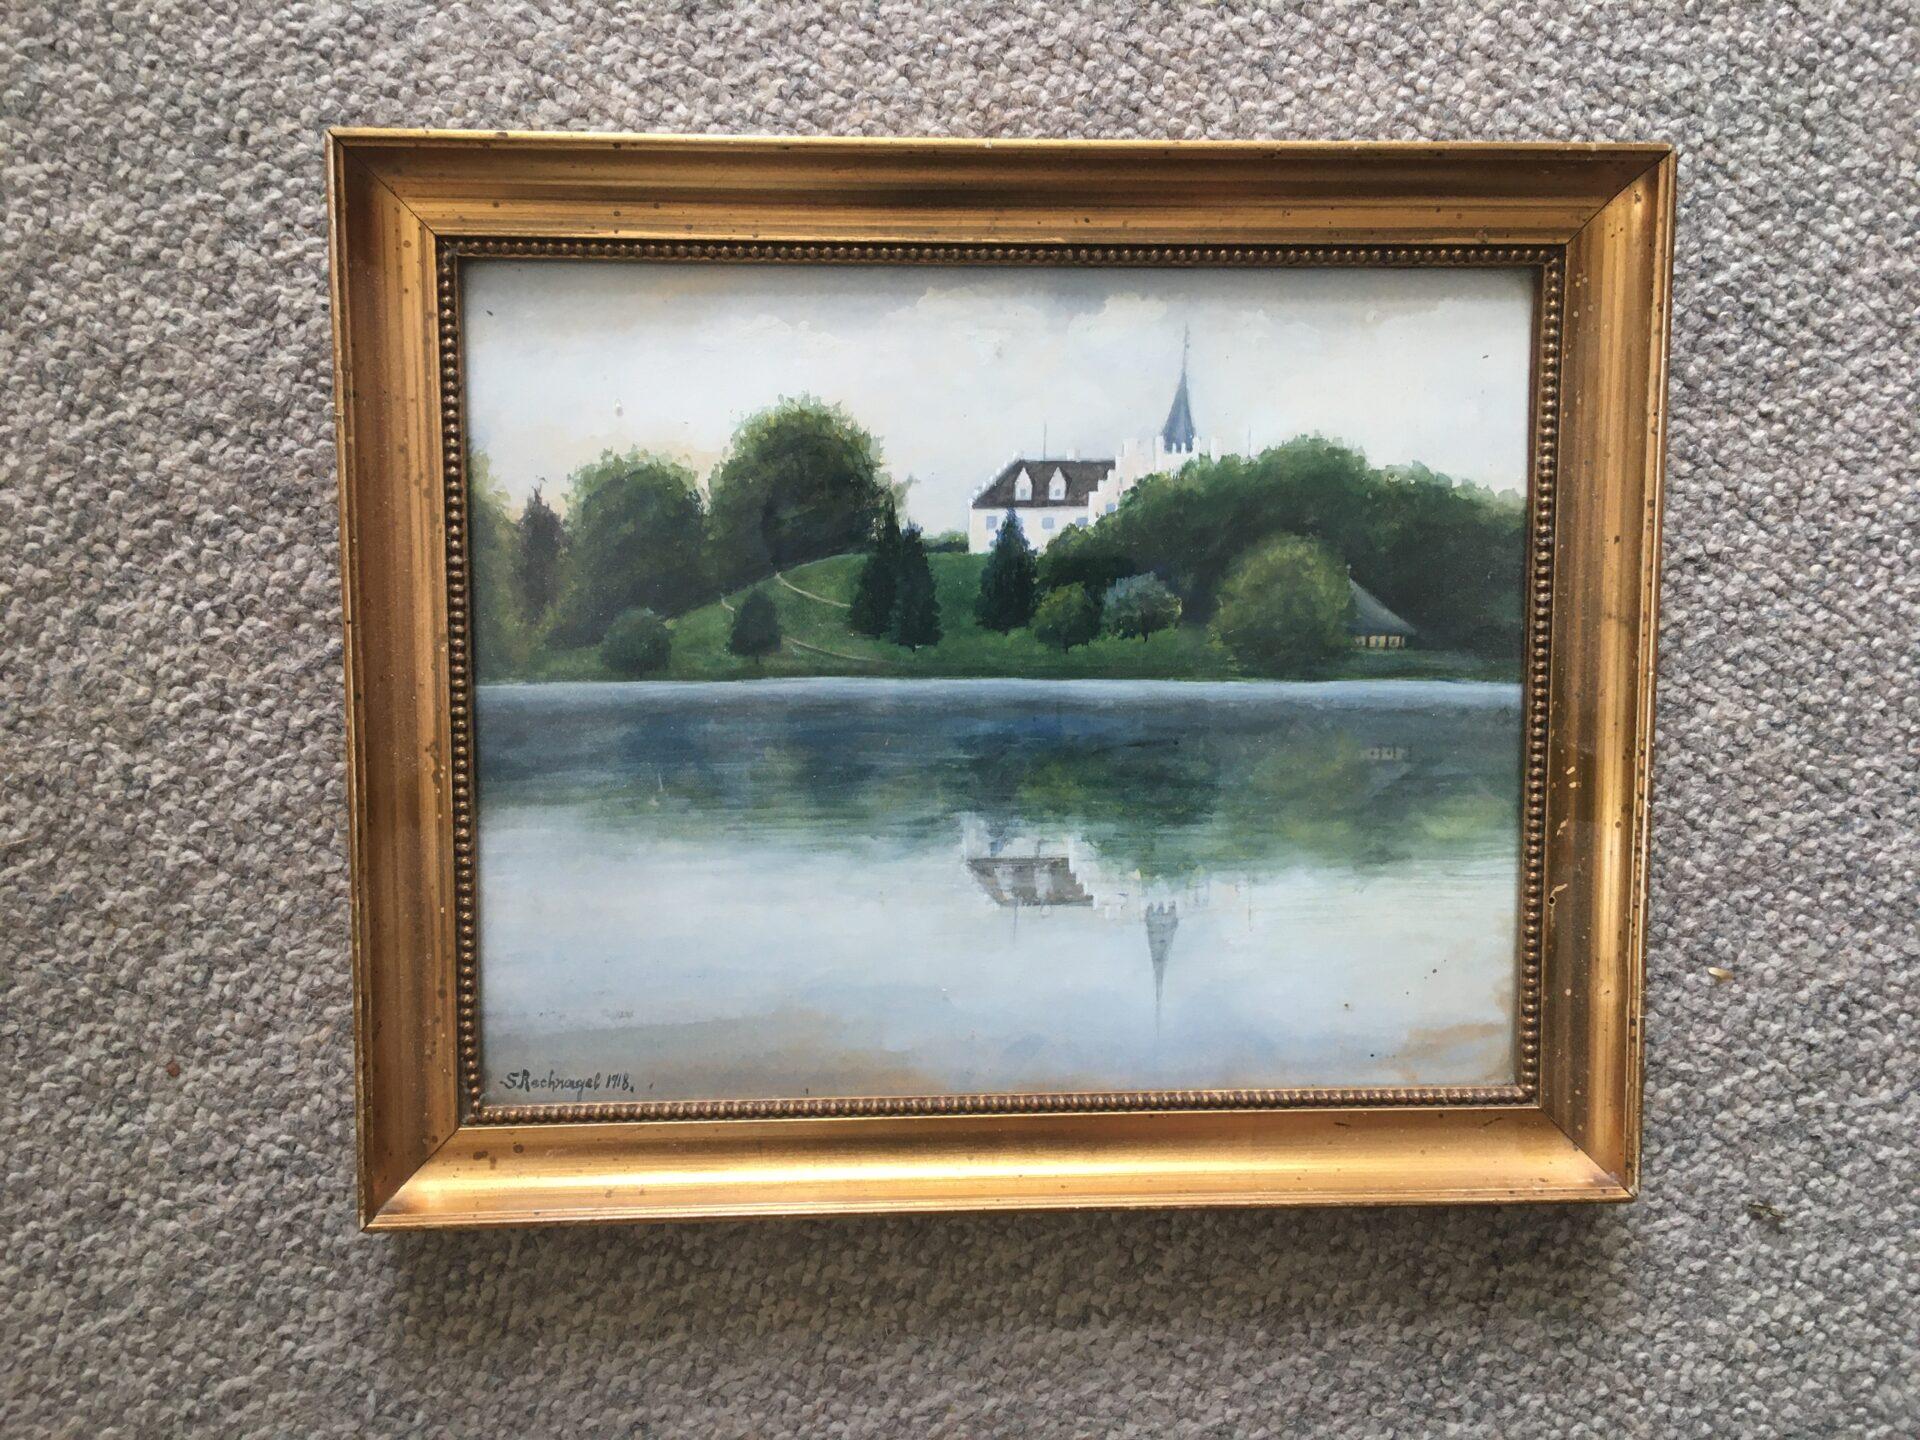 Tranekær slot (akvarel/gouache (sigeneret S.Rechnagel 1918) rammemål 23x29 cm,